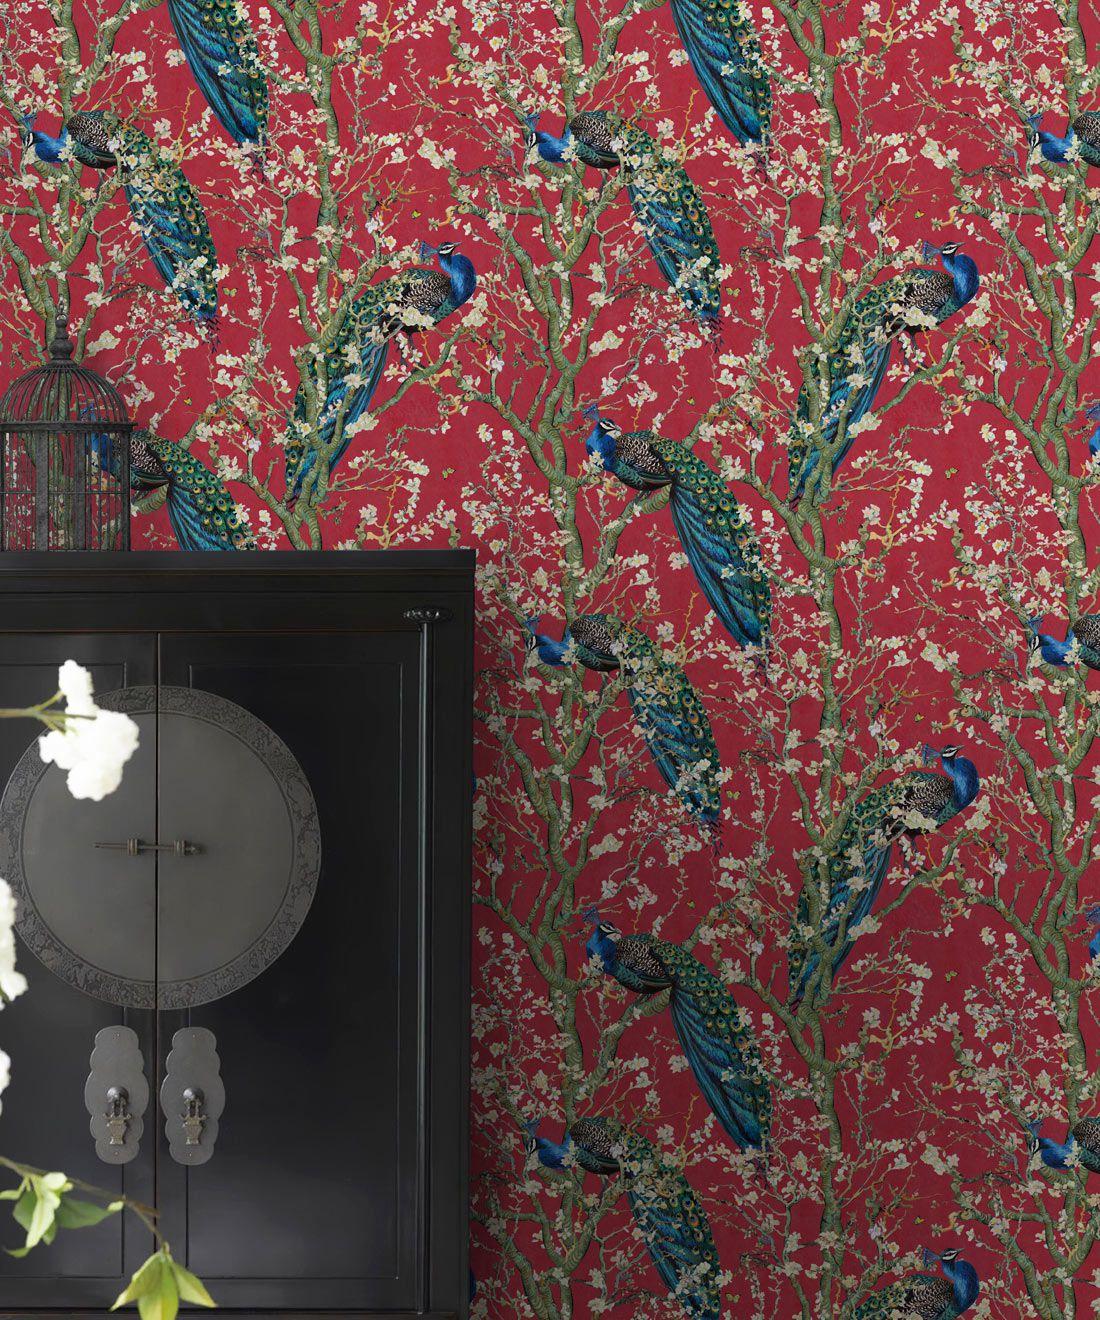 Almond Blossom Wallpaper • Chinoiserie Wallpaper • Wallpaper with Peacocks • Red Lantern Wallpaper •Insitu